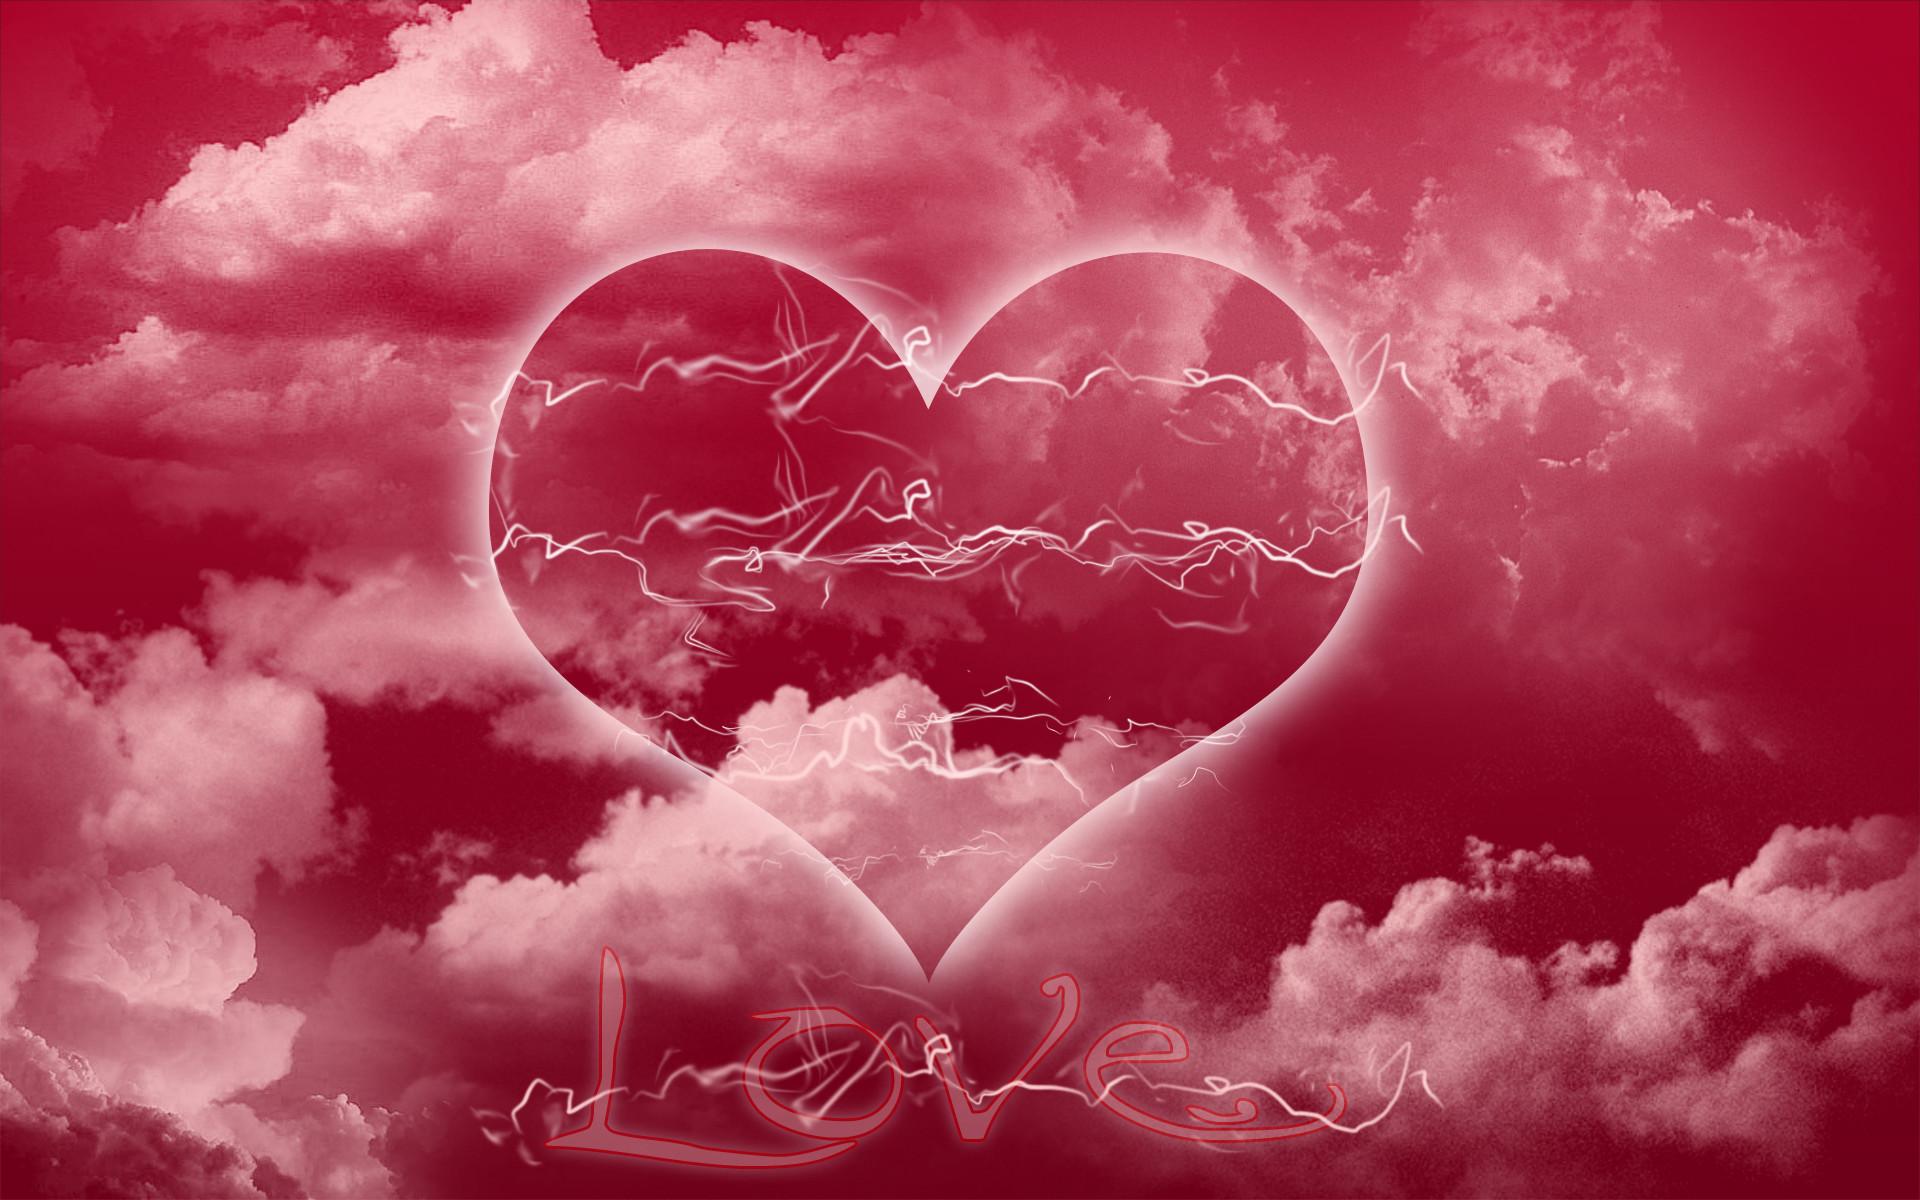 Res: 1920x1200, Heart Widescreen Wallpaper